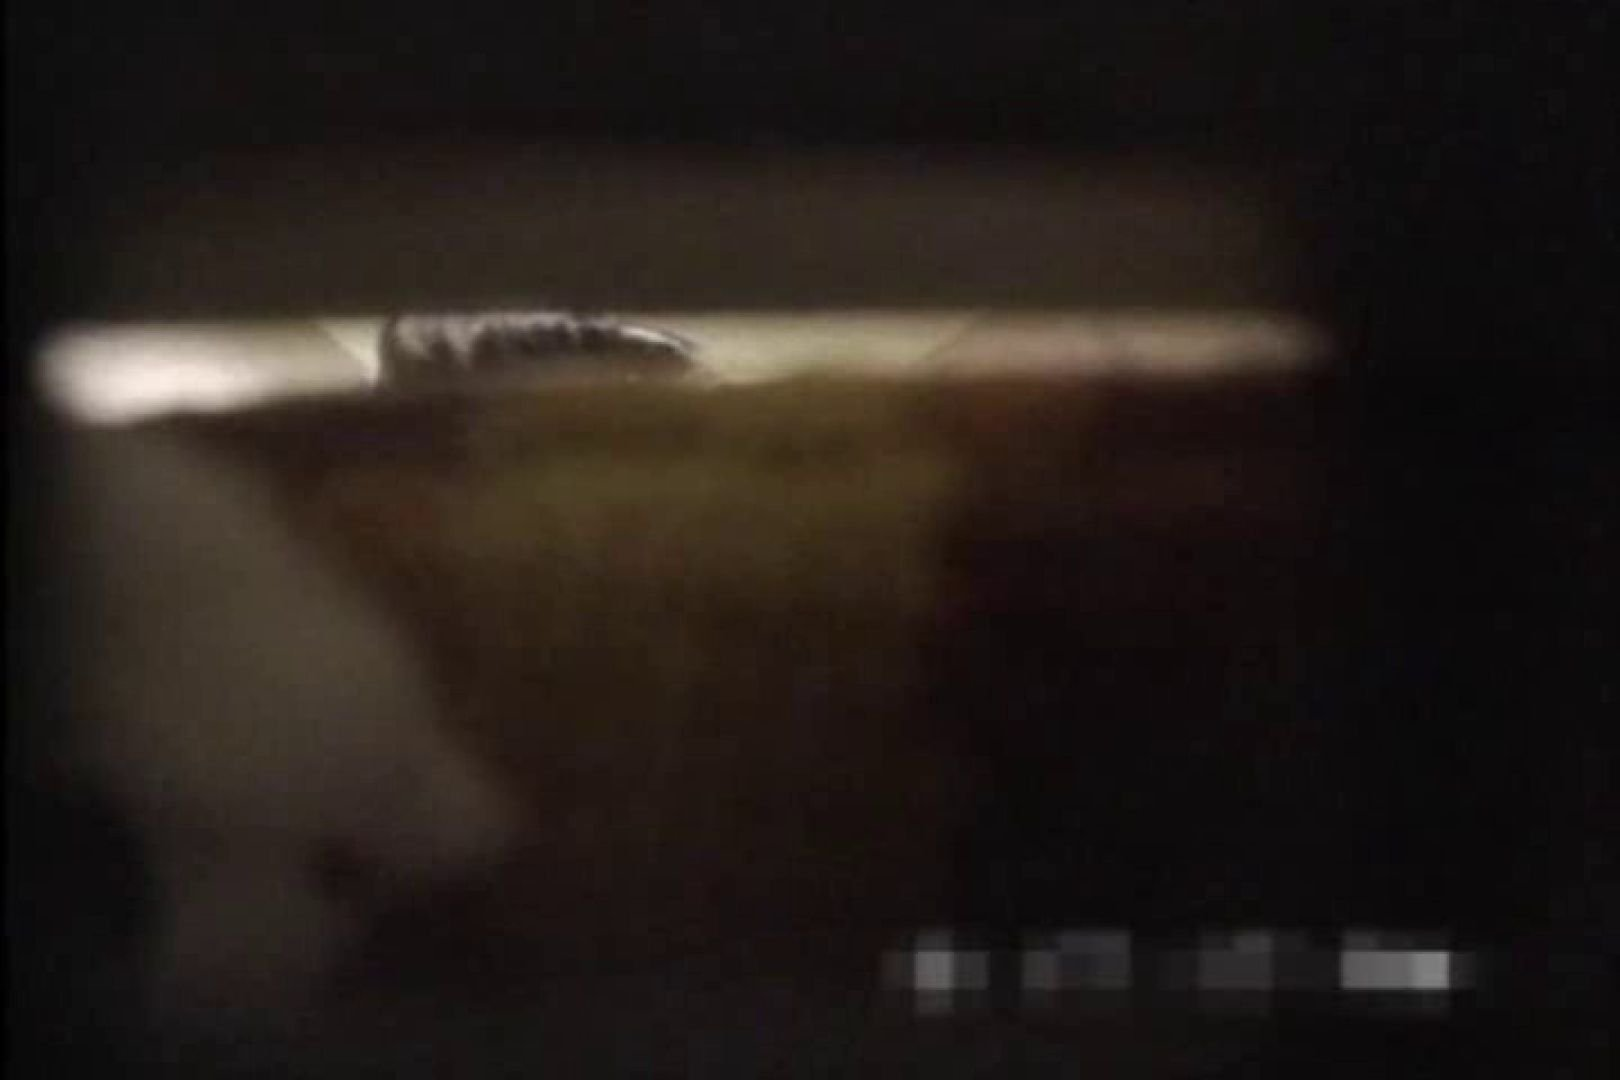 STY-013 実録!2カメde女子洗面所 接写 おまんこ無修正動画無料 113pic 53